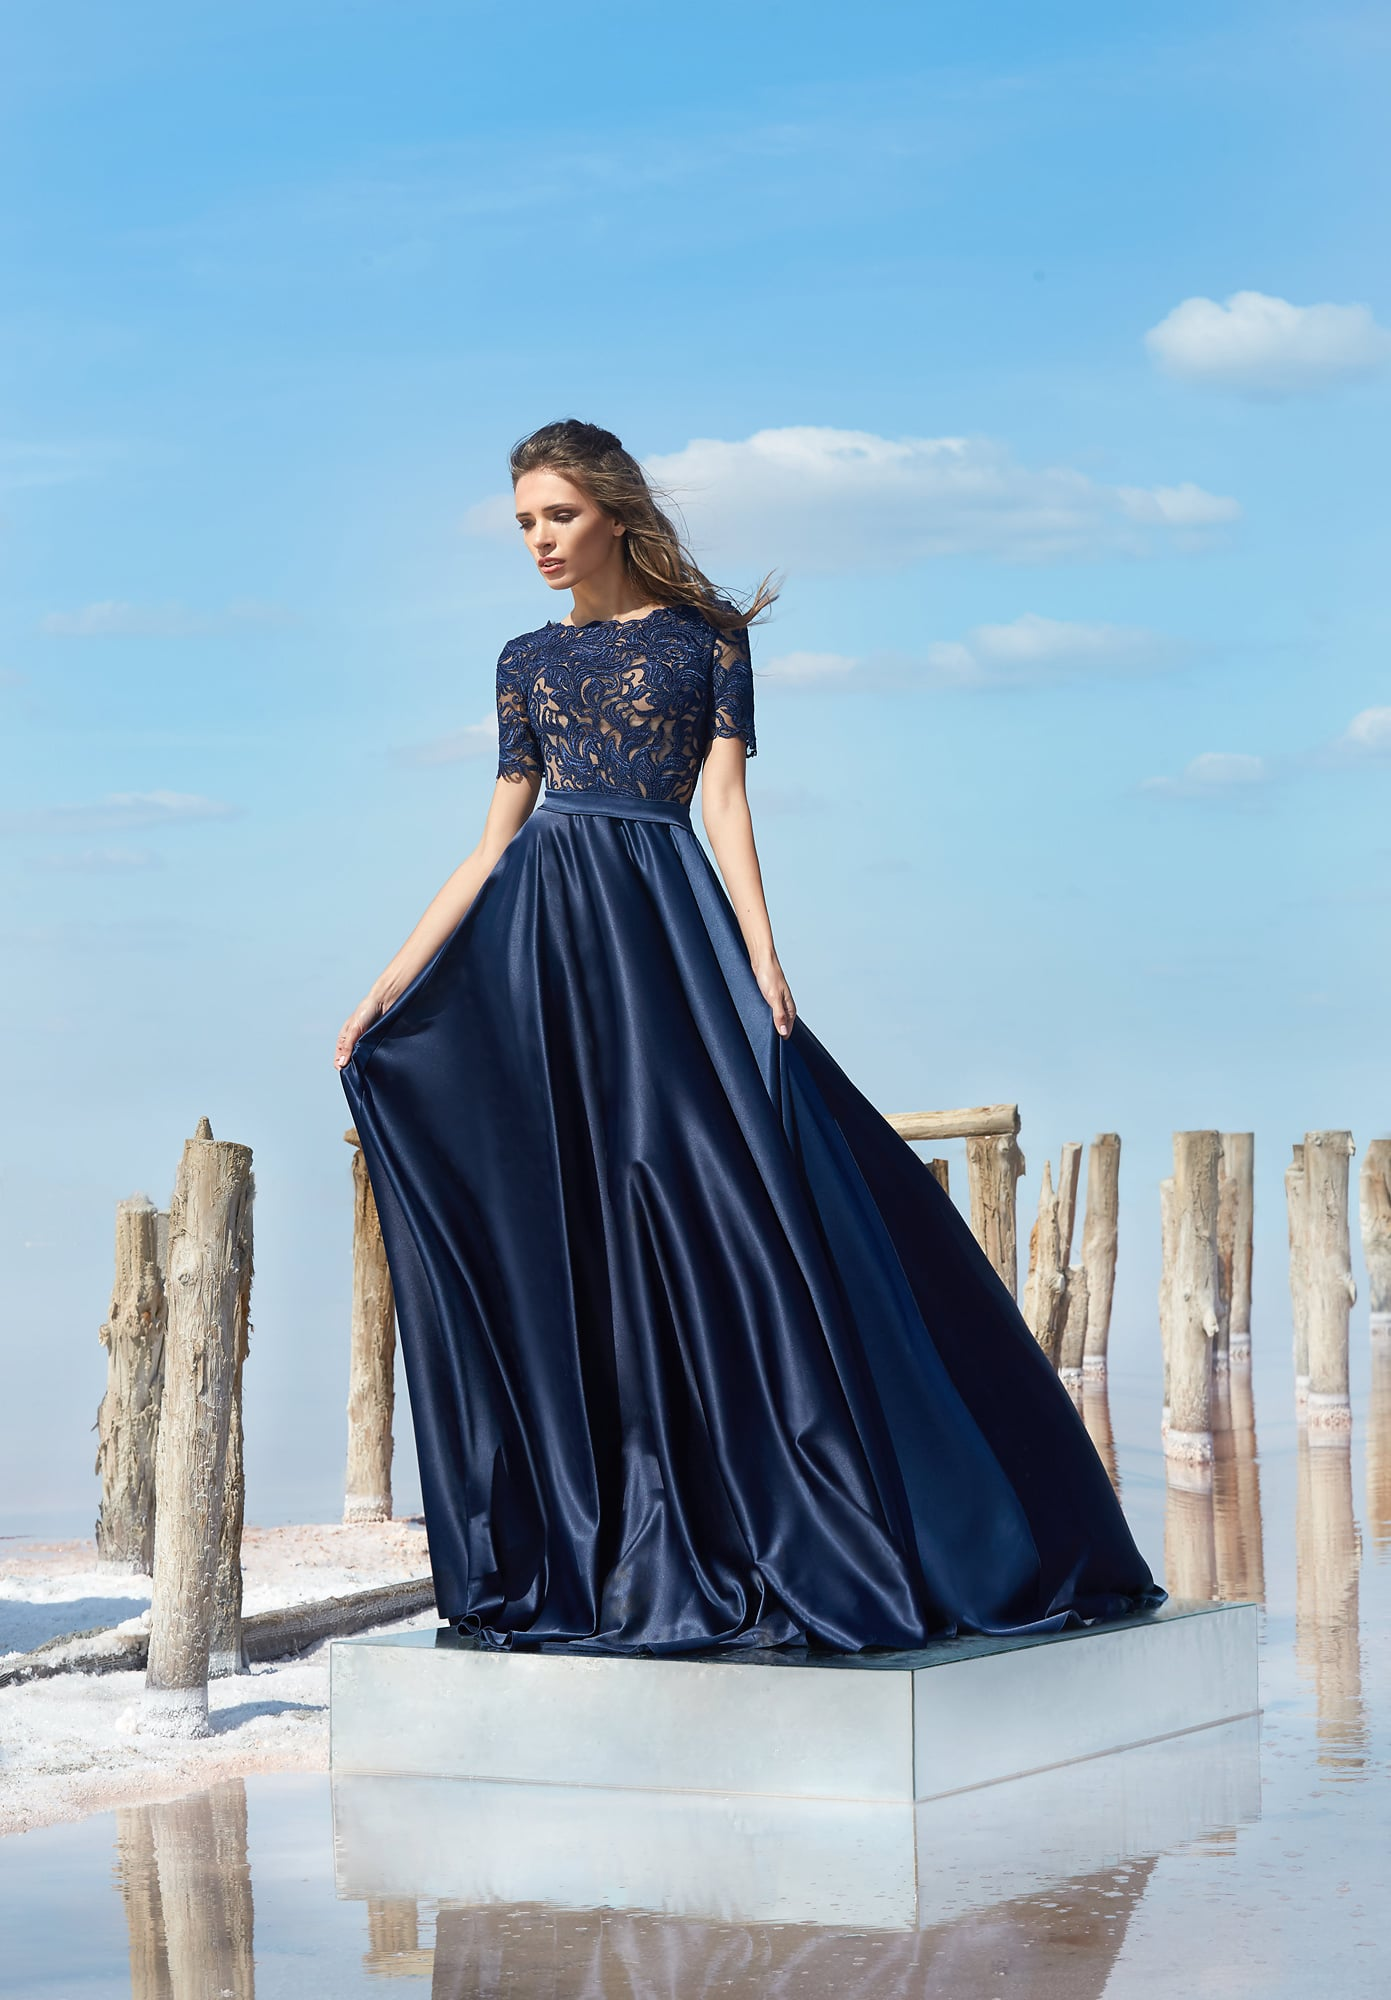 b737ddac9f6 Праздничное вечернее платье Armonia Тааль. Купить вечернее платье в ...